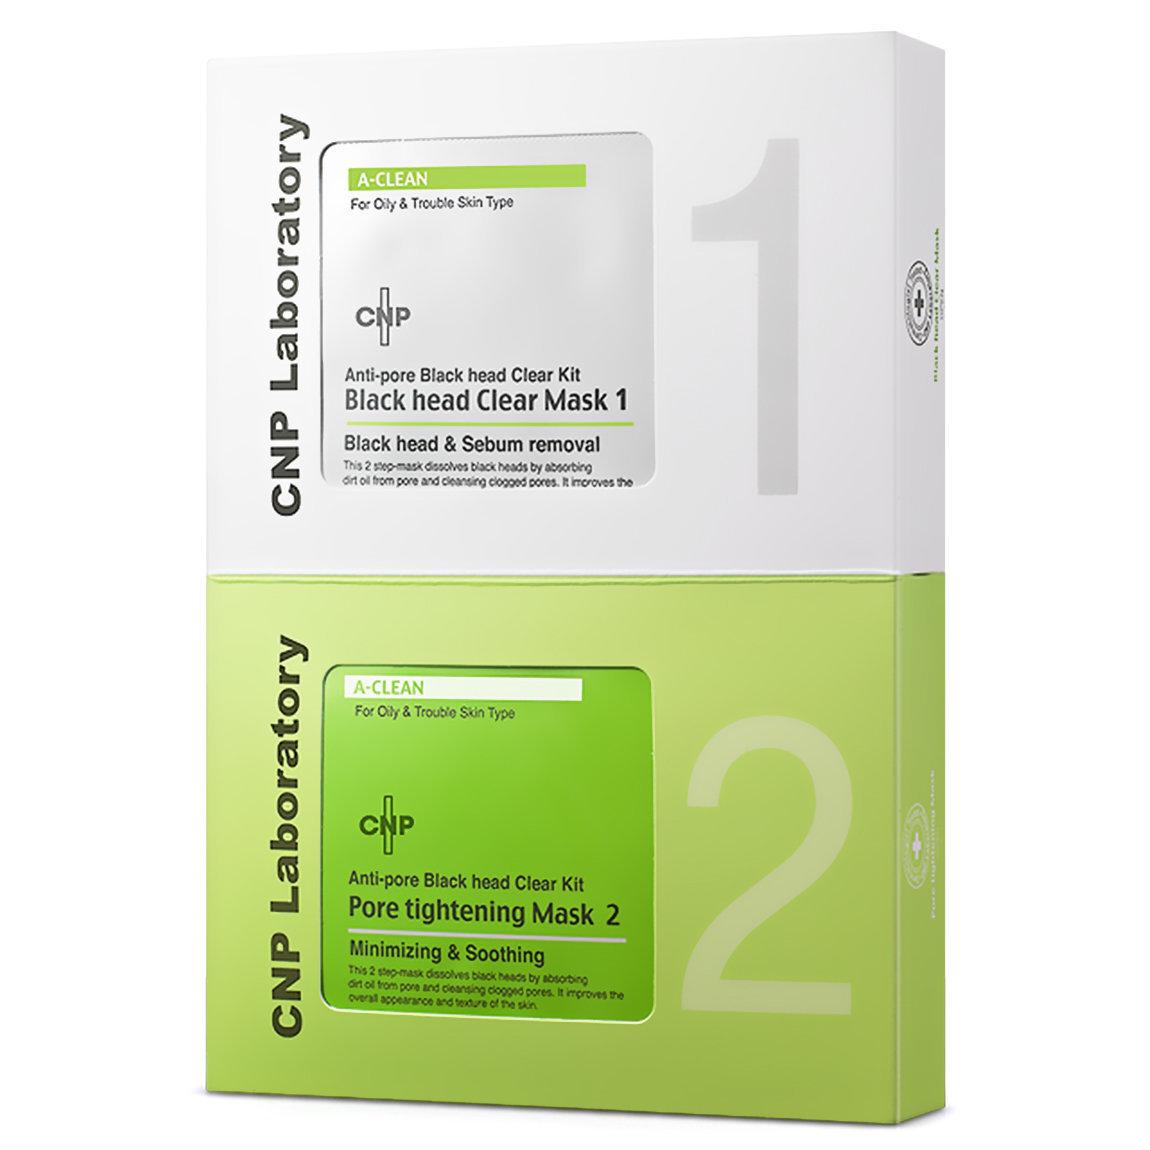 CNP Laboratory Anti-Pore Black Head Clear Kit 10 Piece Set alternative view 1 - product swatch.